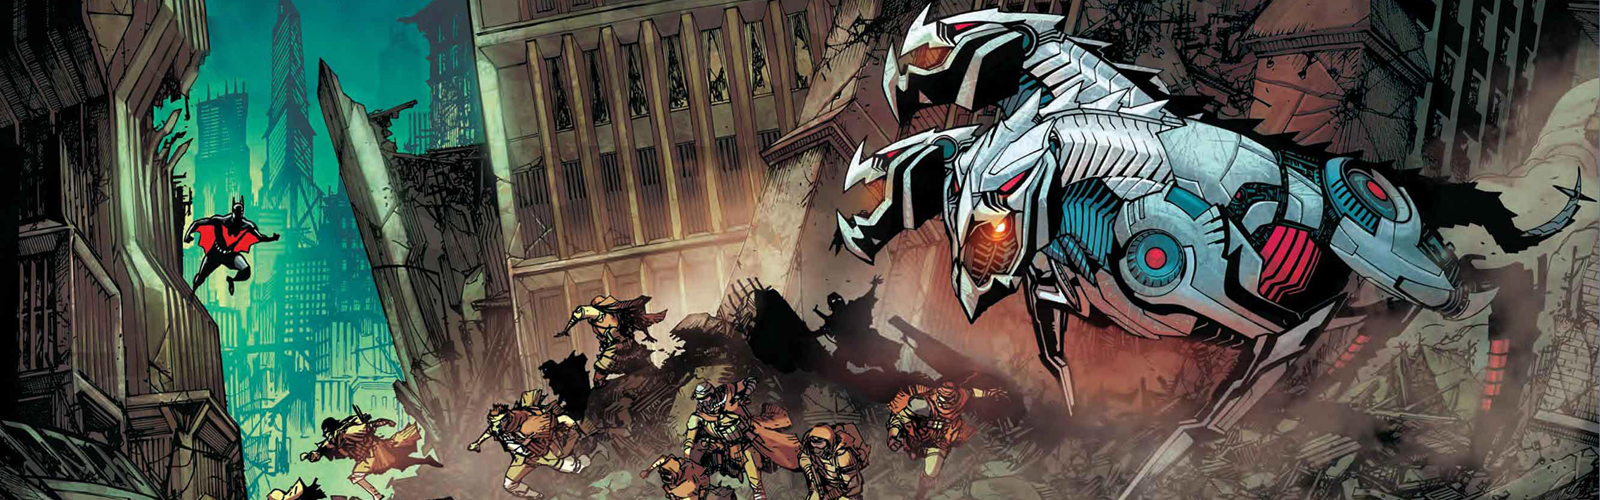 New Releases - 03-06-15: Batman Beyond